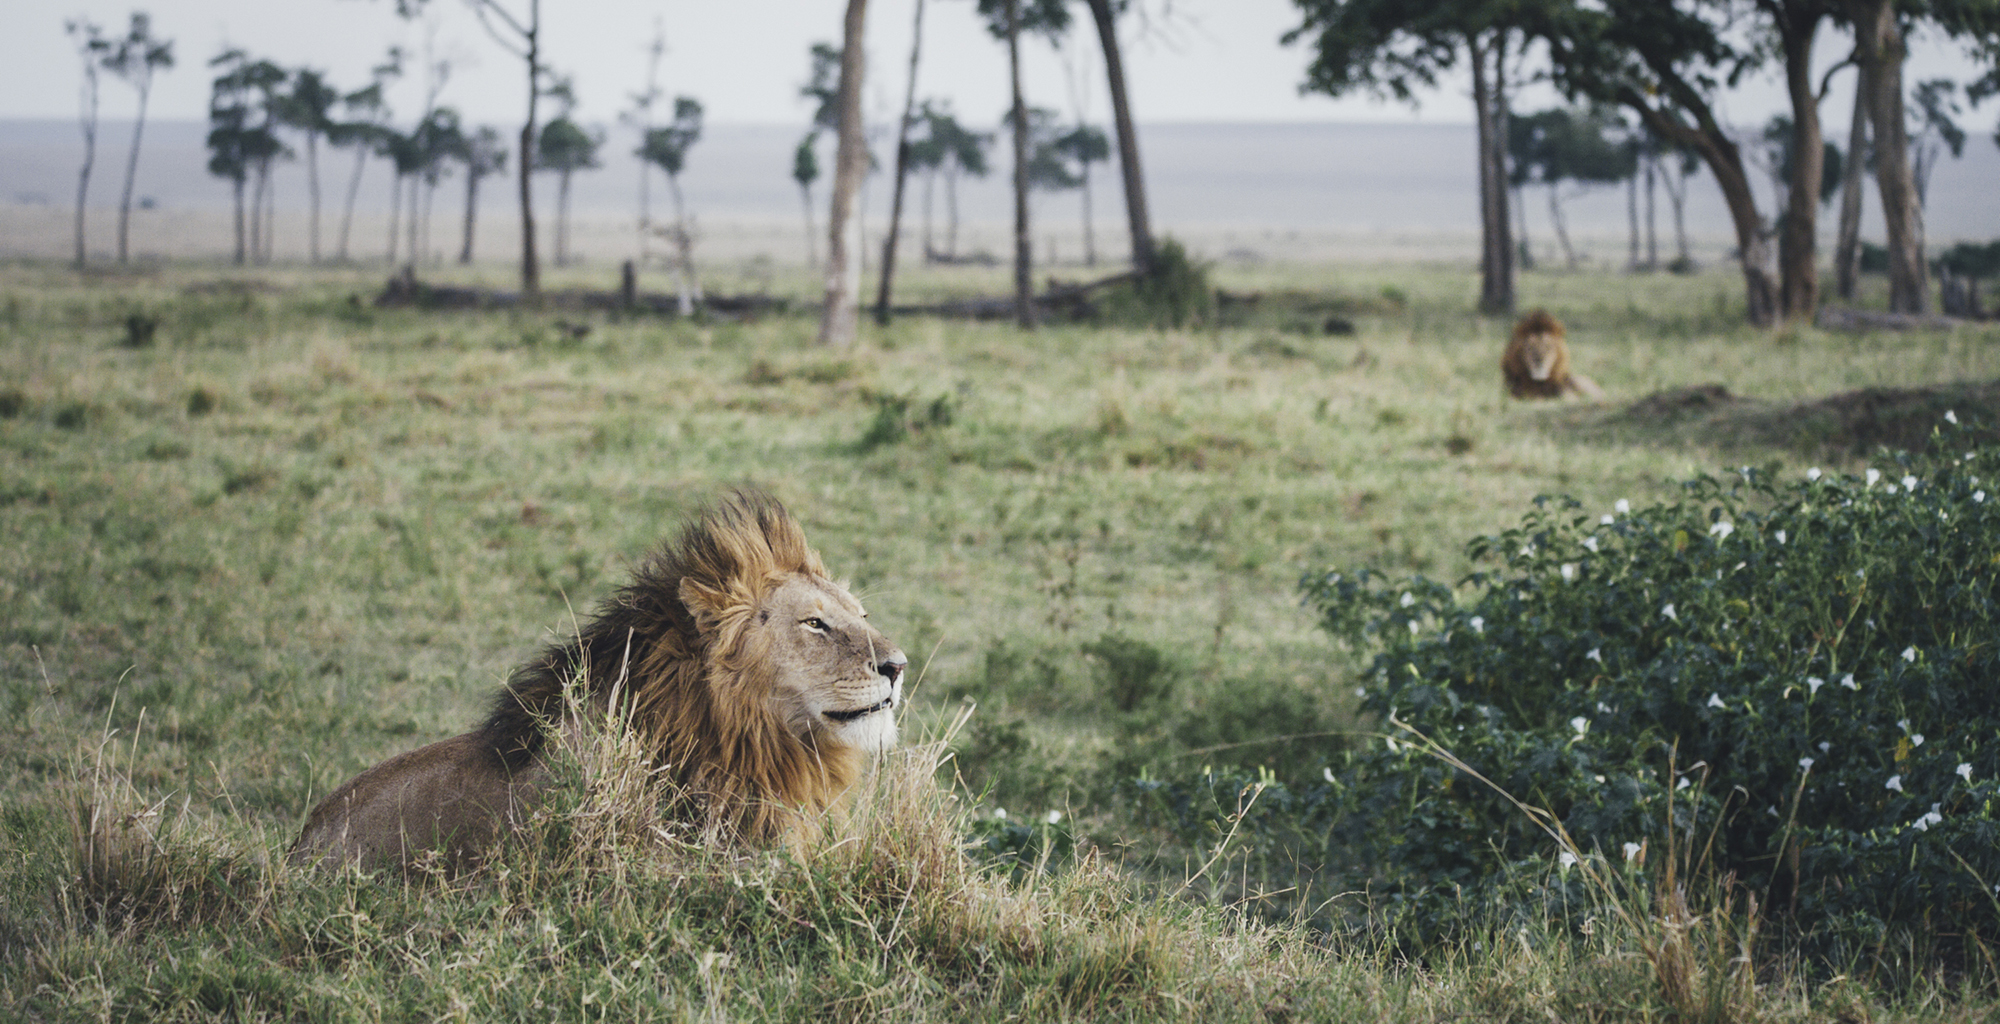 Kenya-Tangulia-Mara-Lion